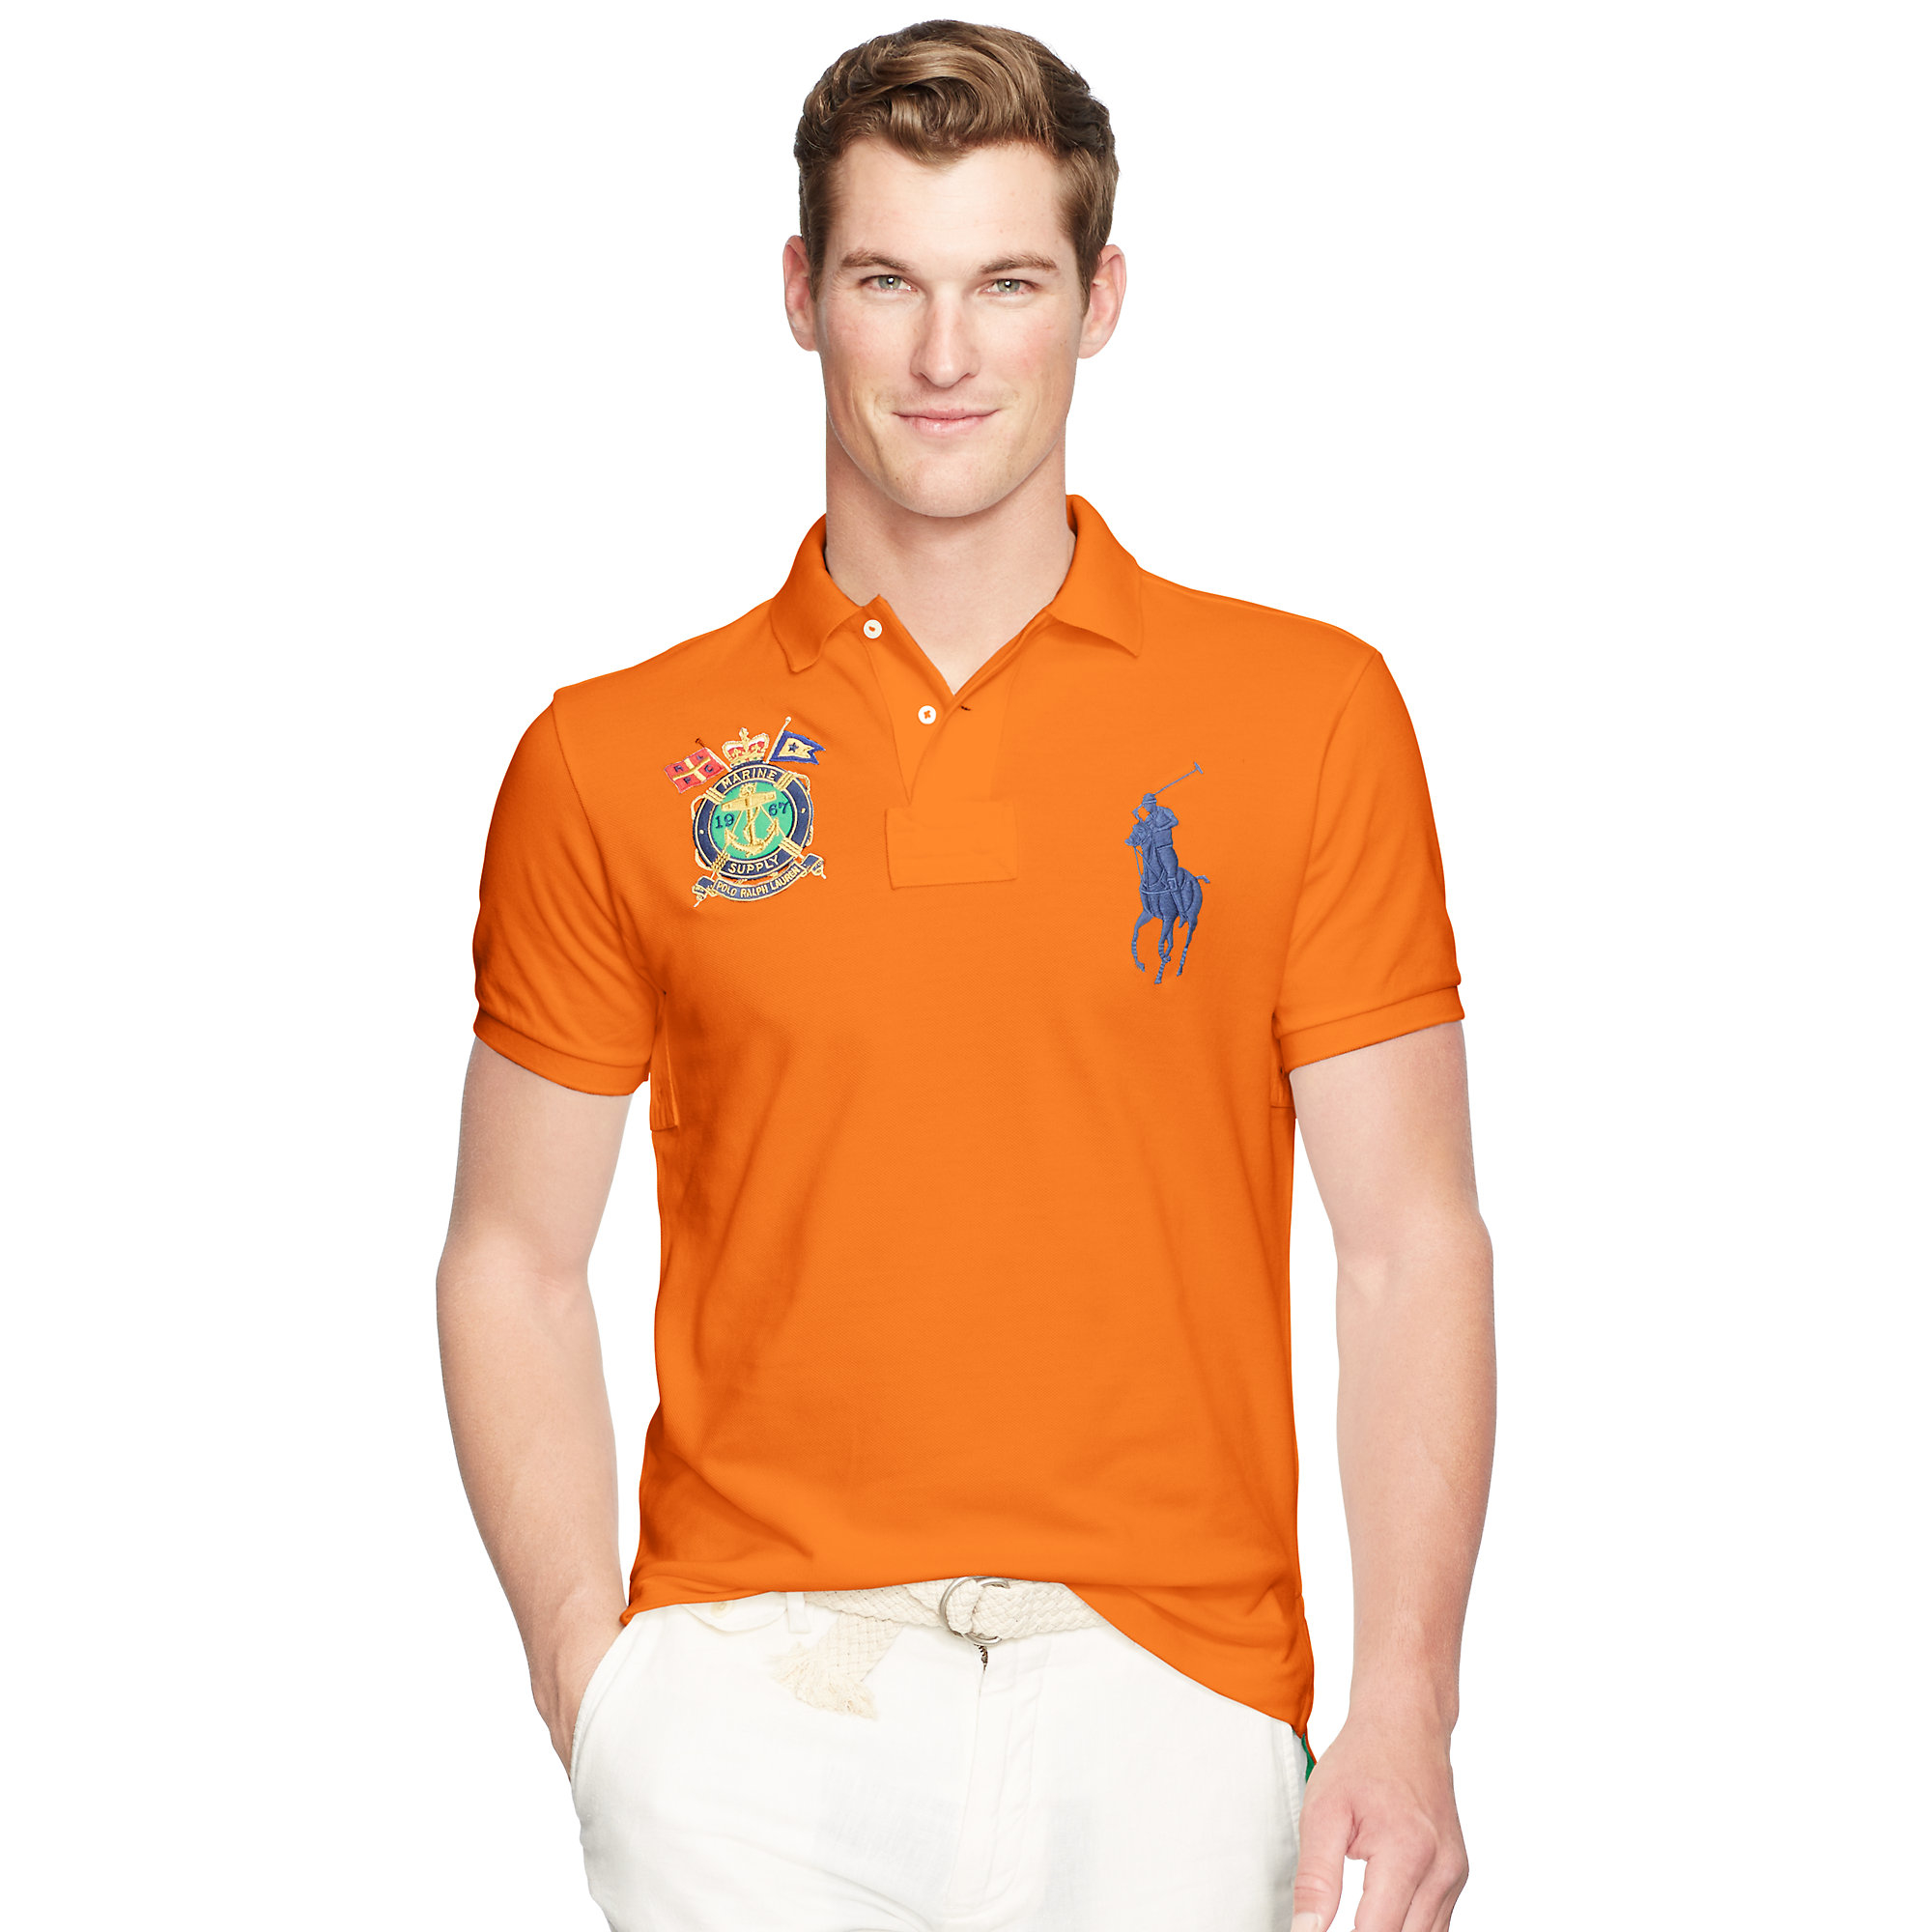 c98994bd4 ... discount lyst polo ralph lauren slim fit big pony polo shirt in orange  for men 3c014